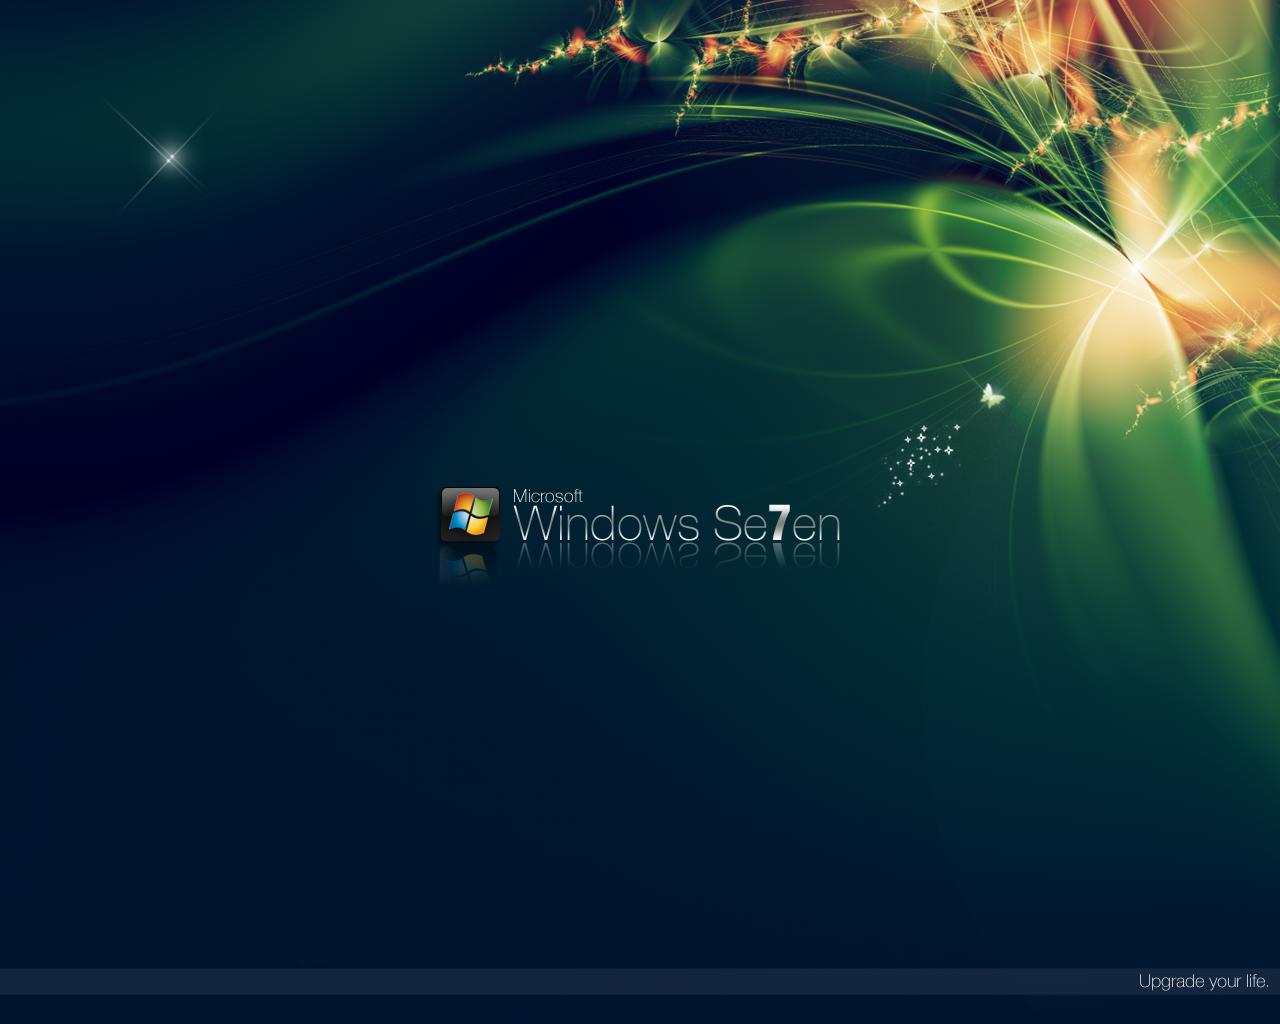 Download Wallpapers: Windows 7 Wallpapers